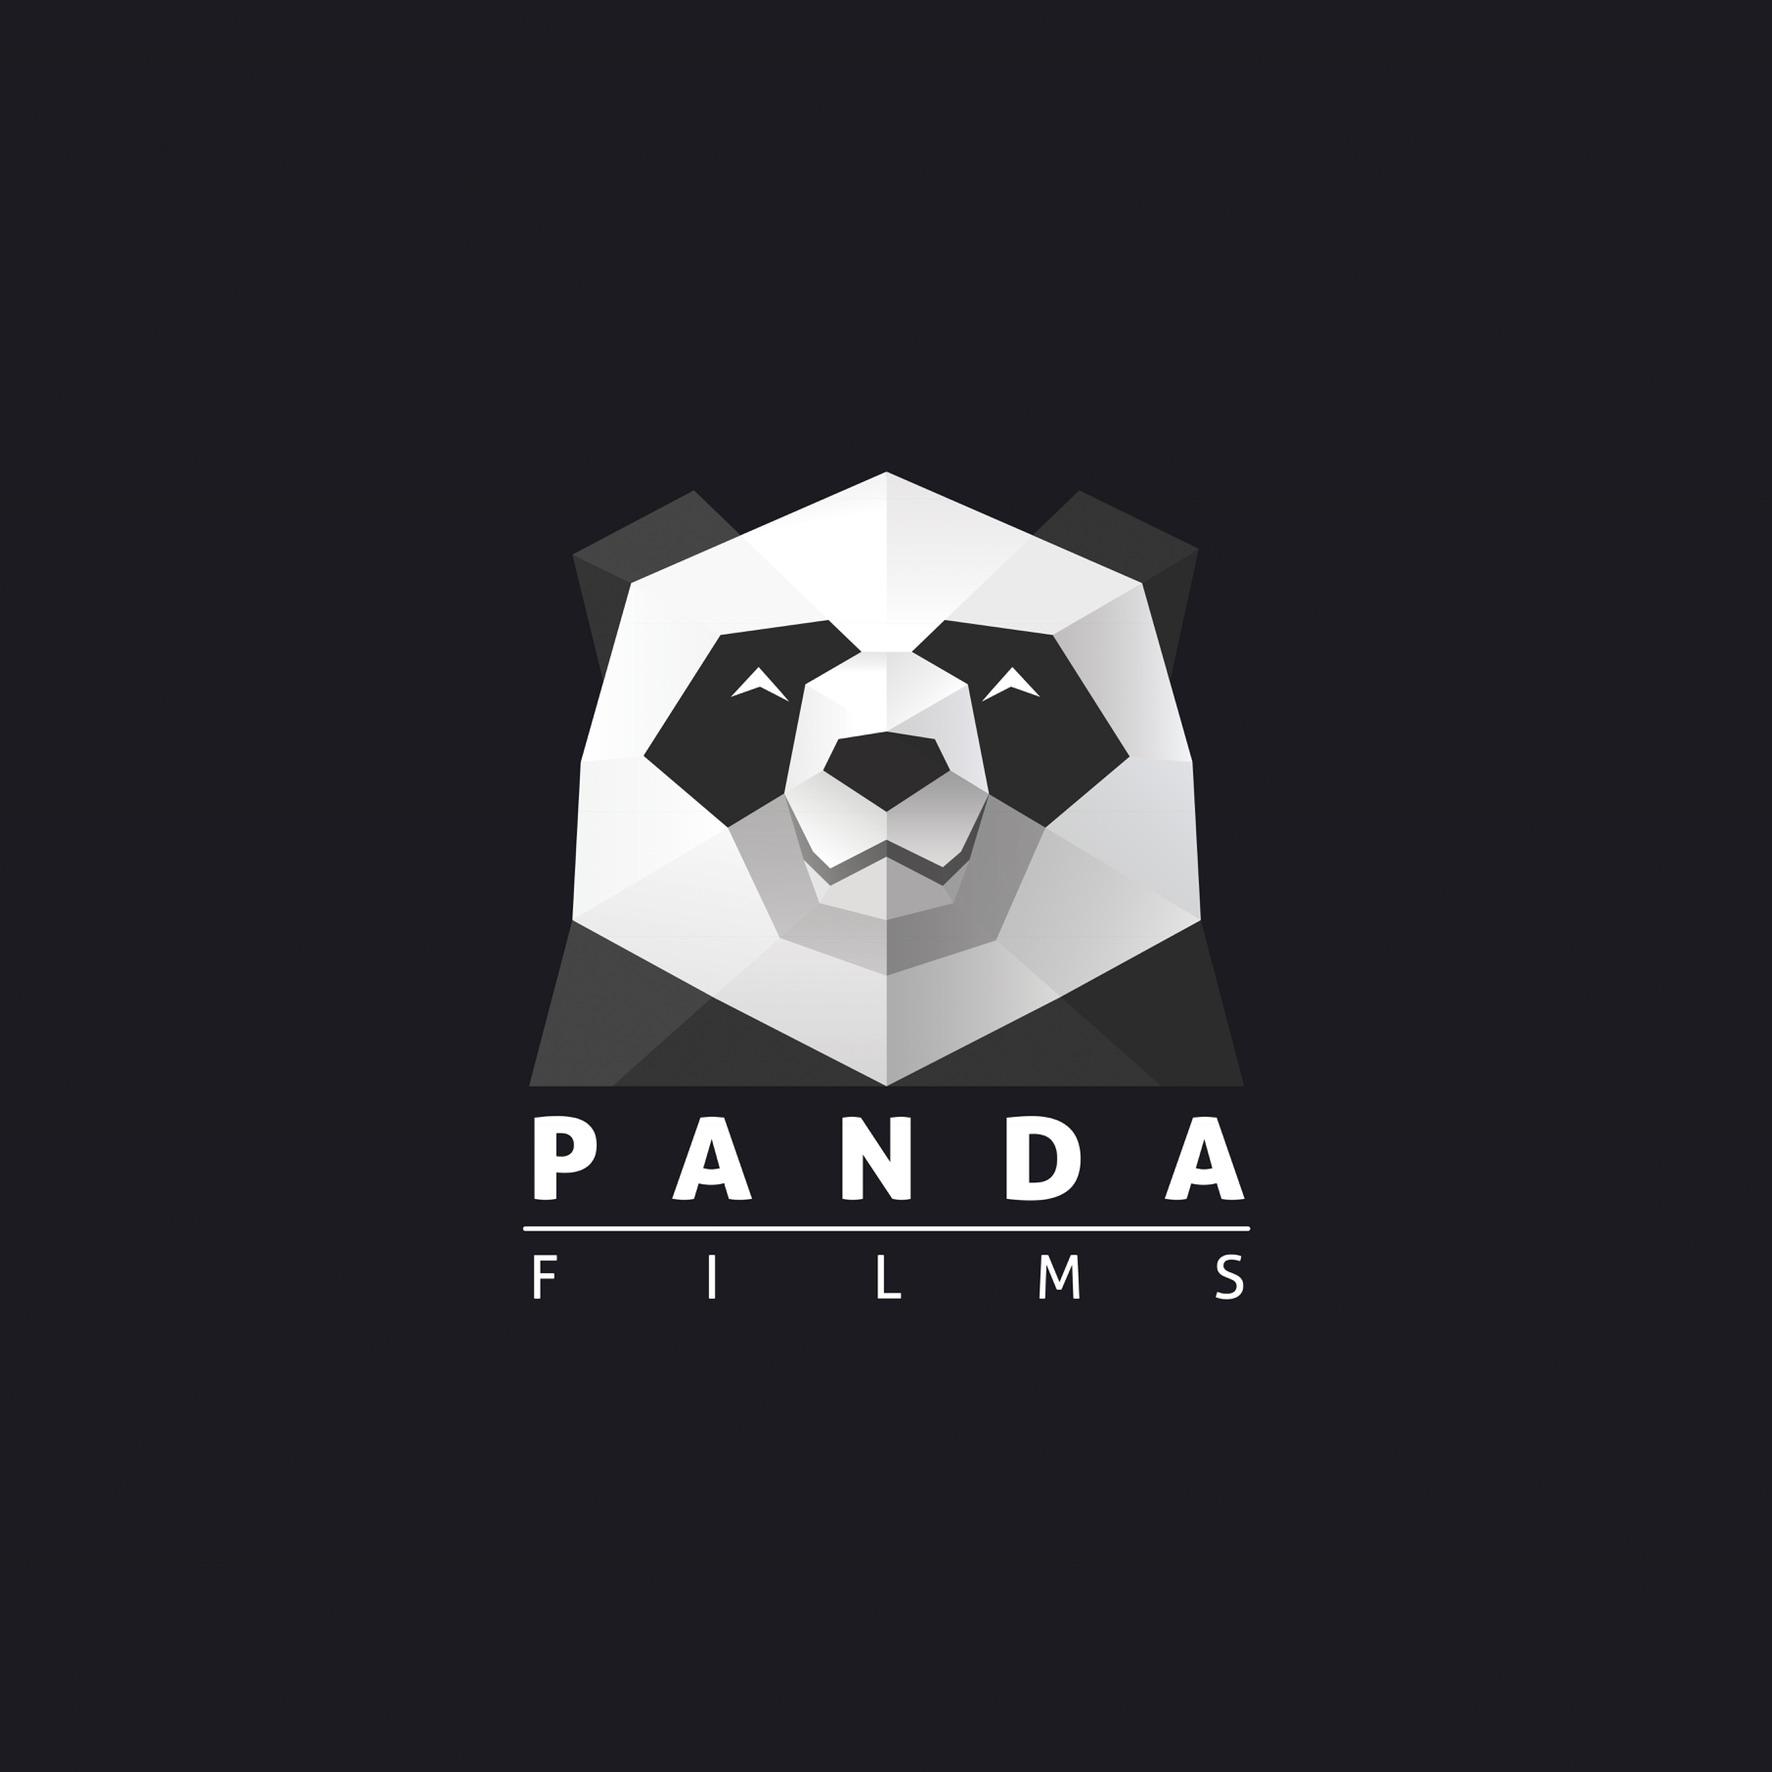 Panda Films